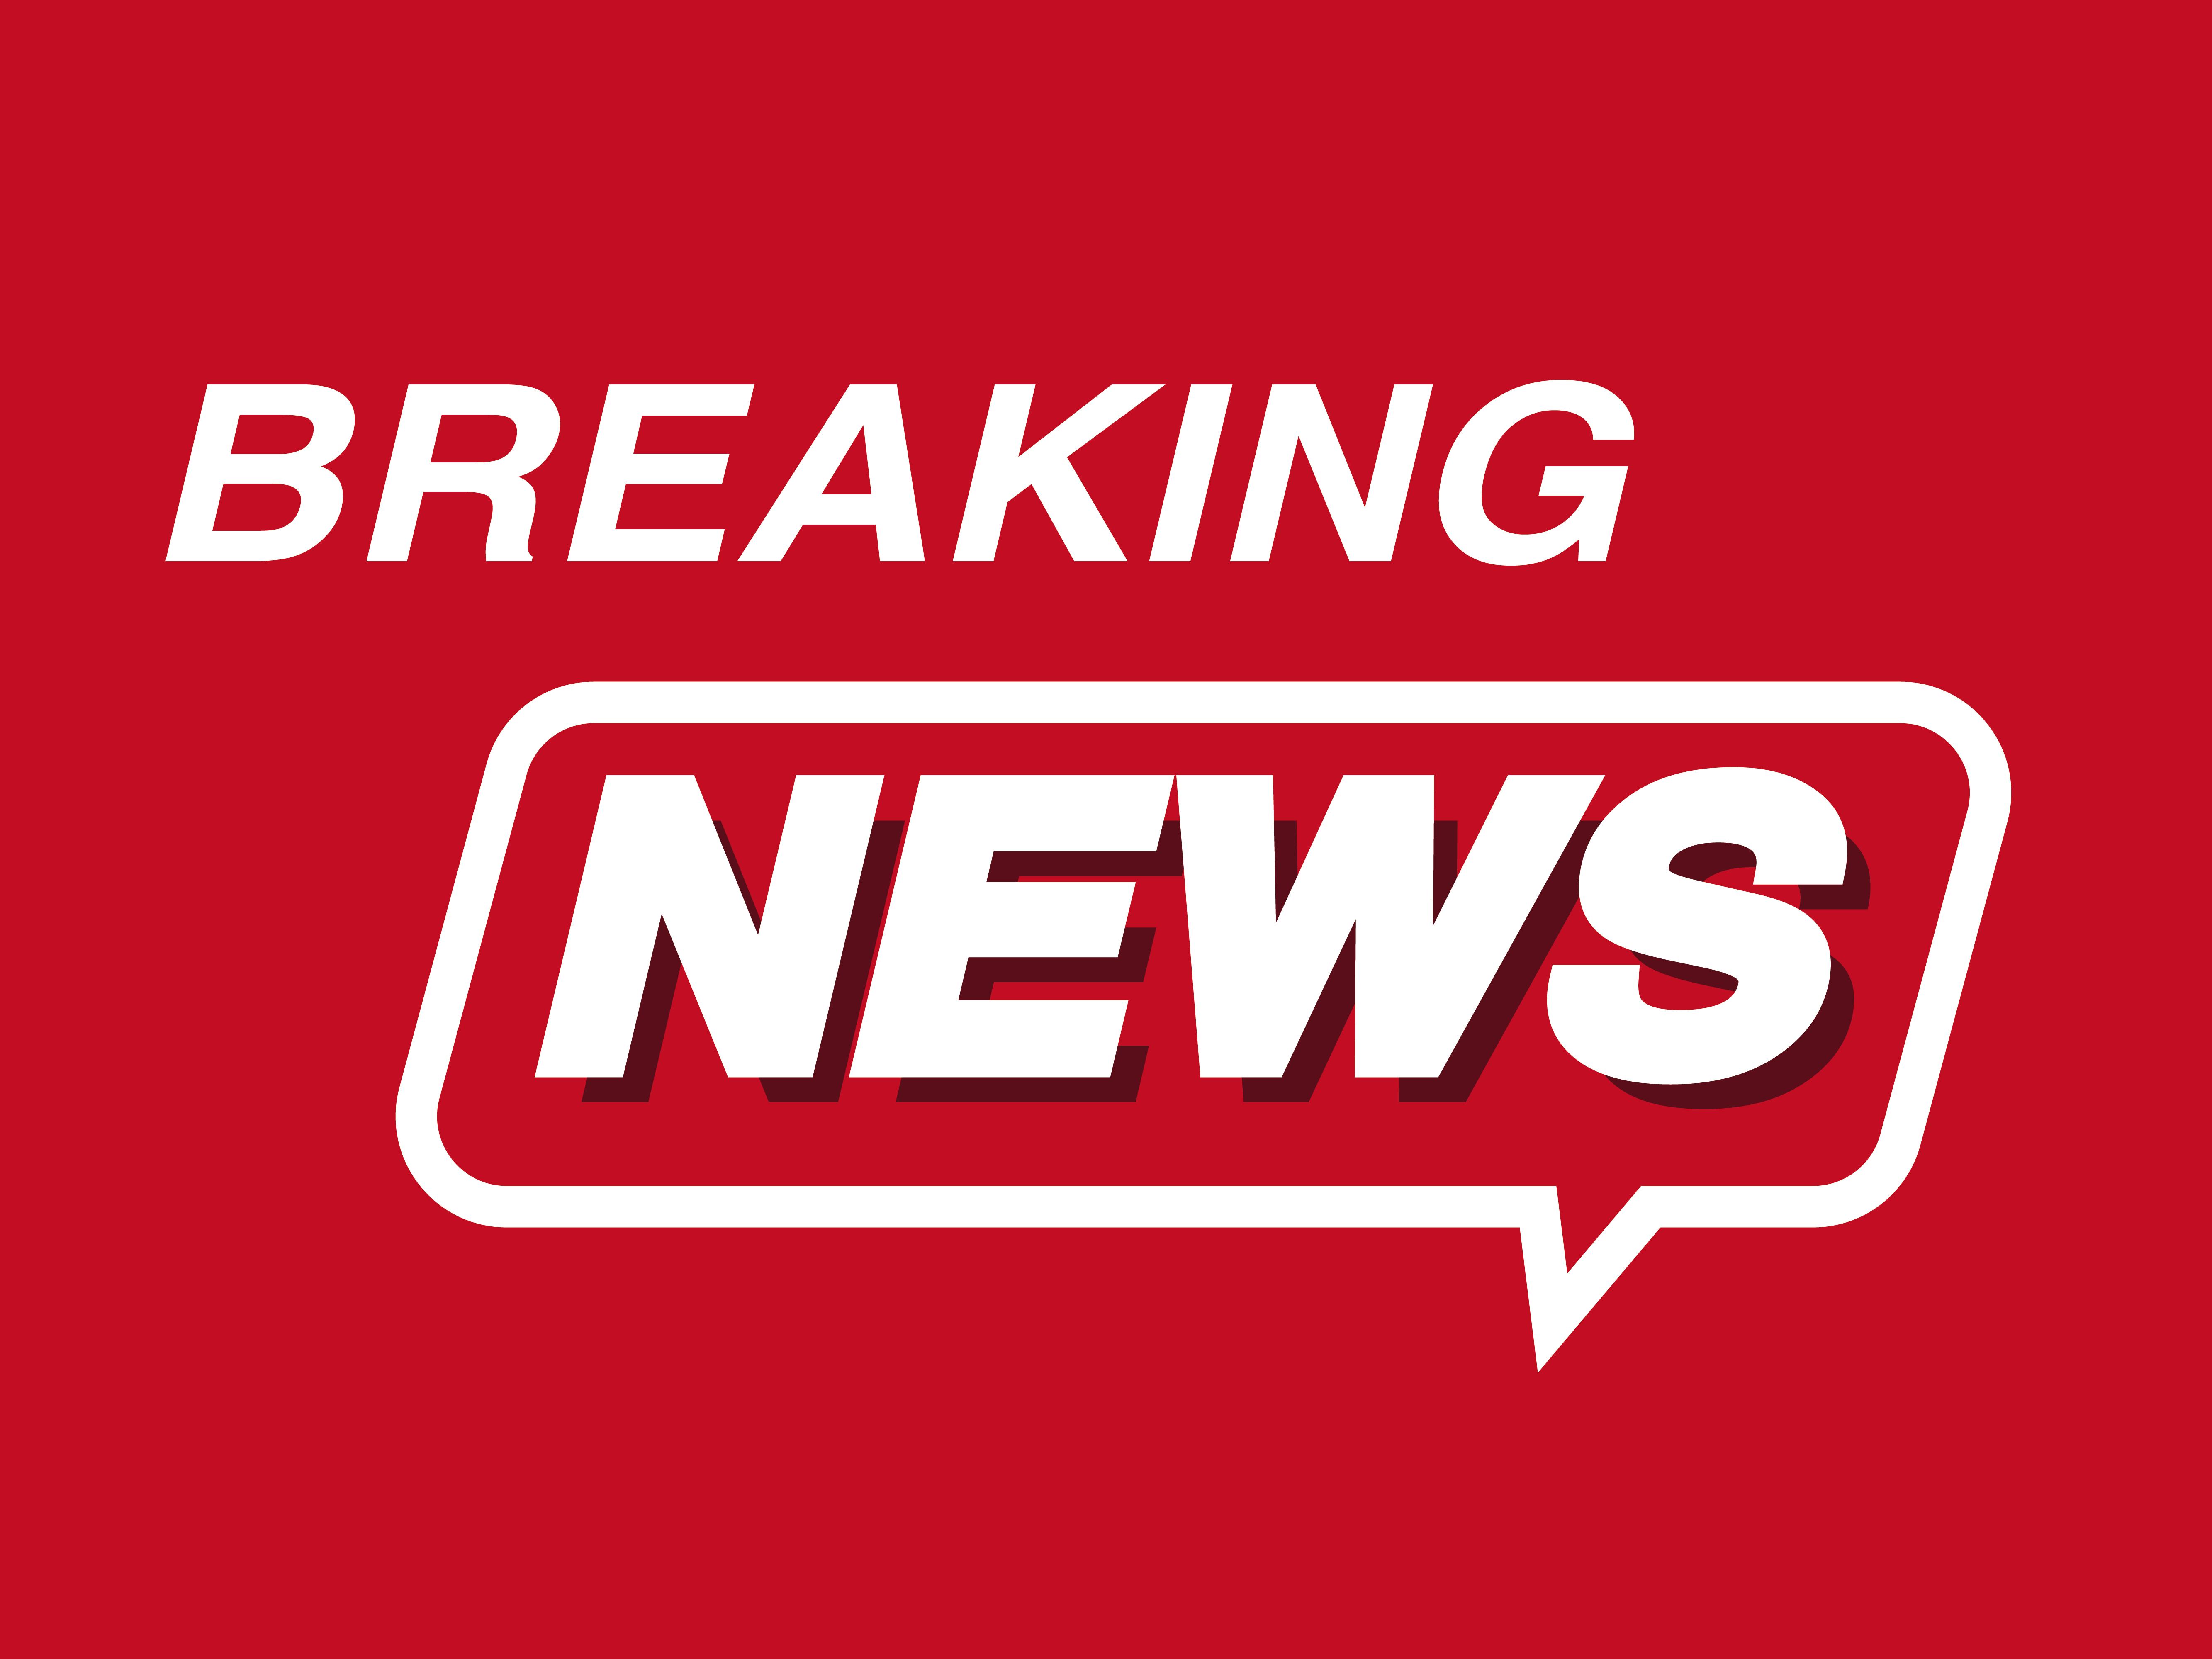 6.0-magnitude quake hits 135 km ENE of L'Esperance Rock, New Zealand: USGS